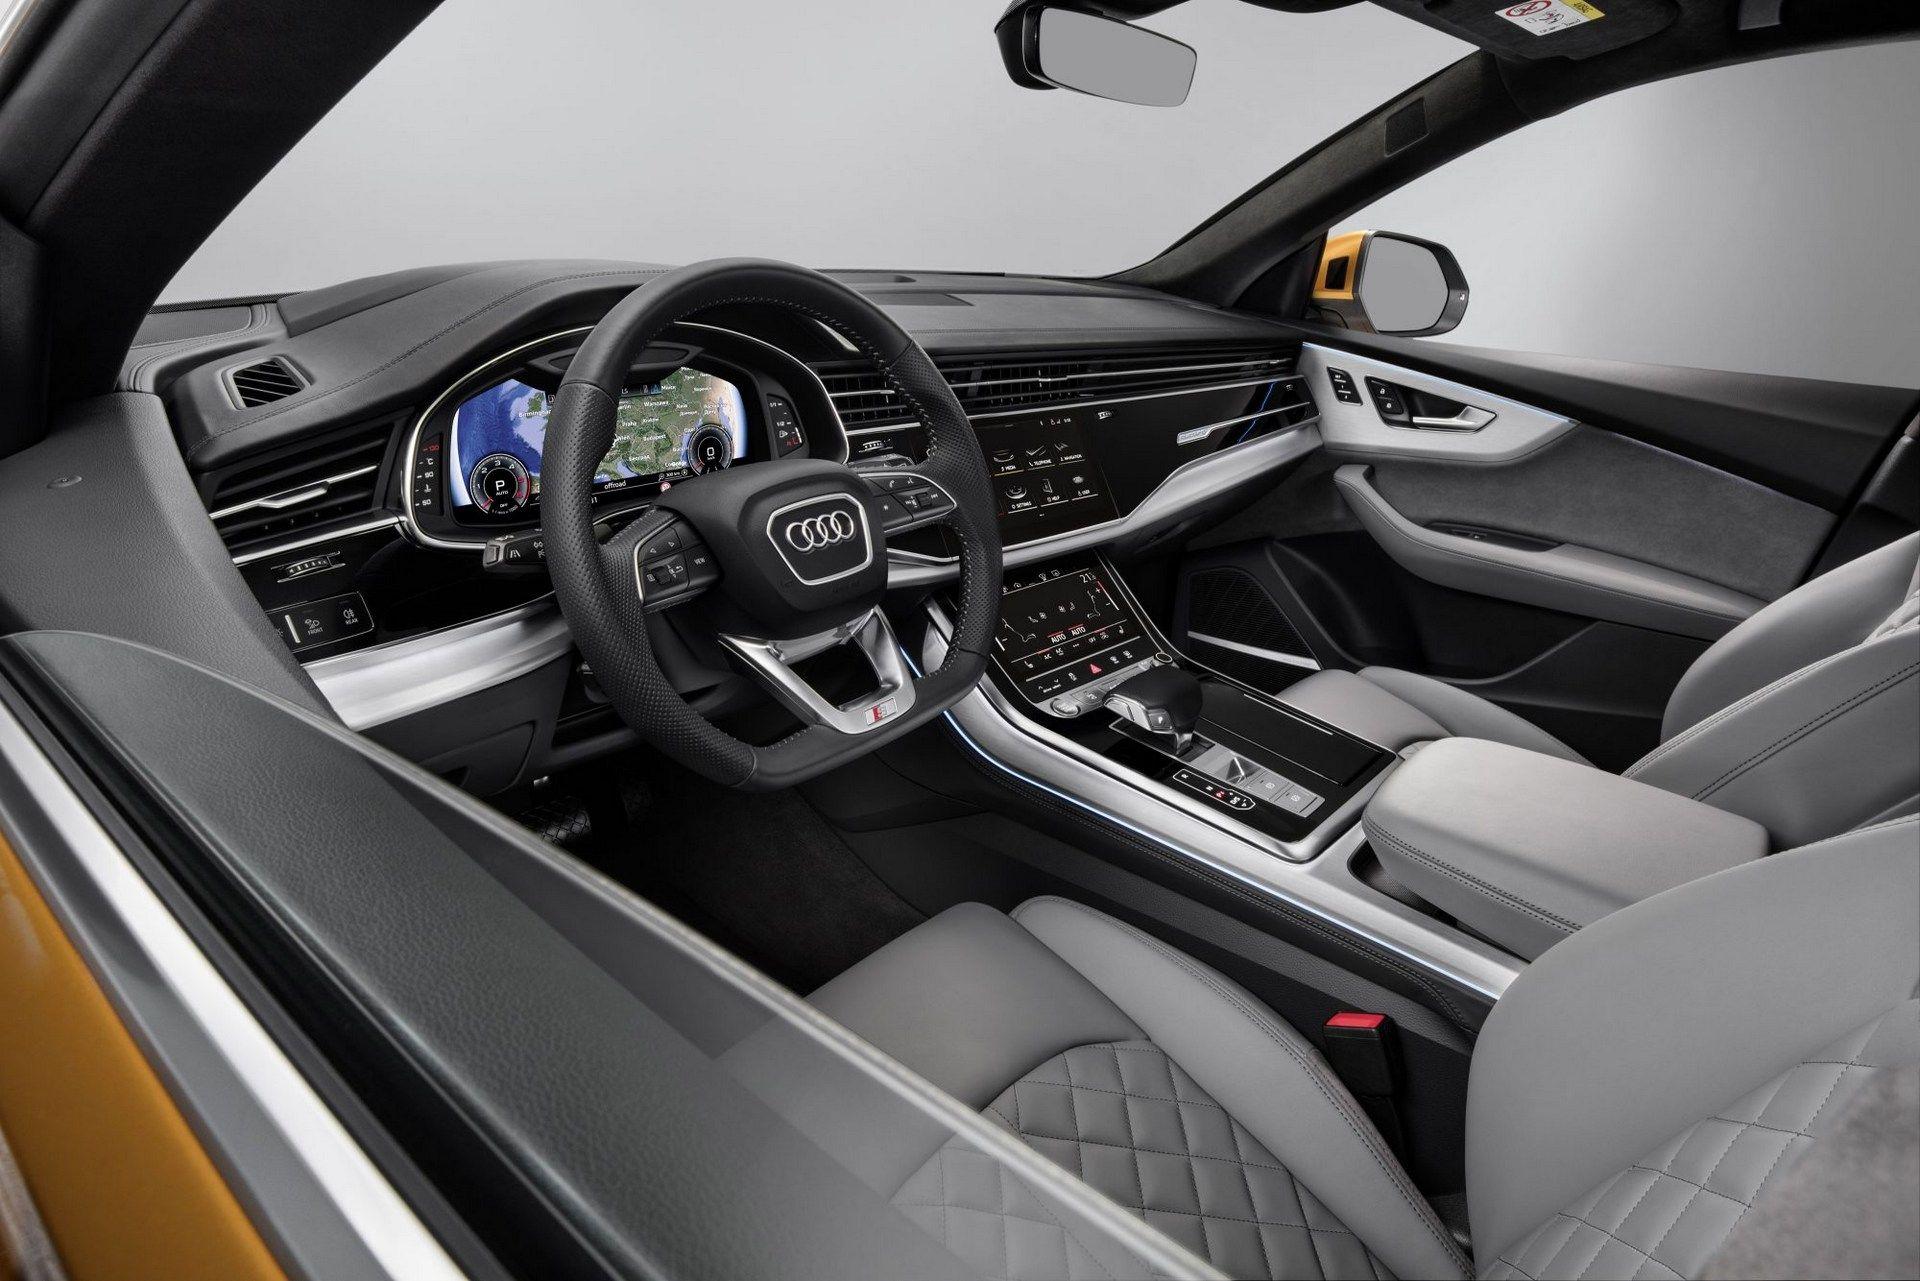 Audi Q8 2018 First Photos (14)